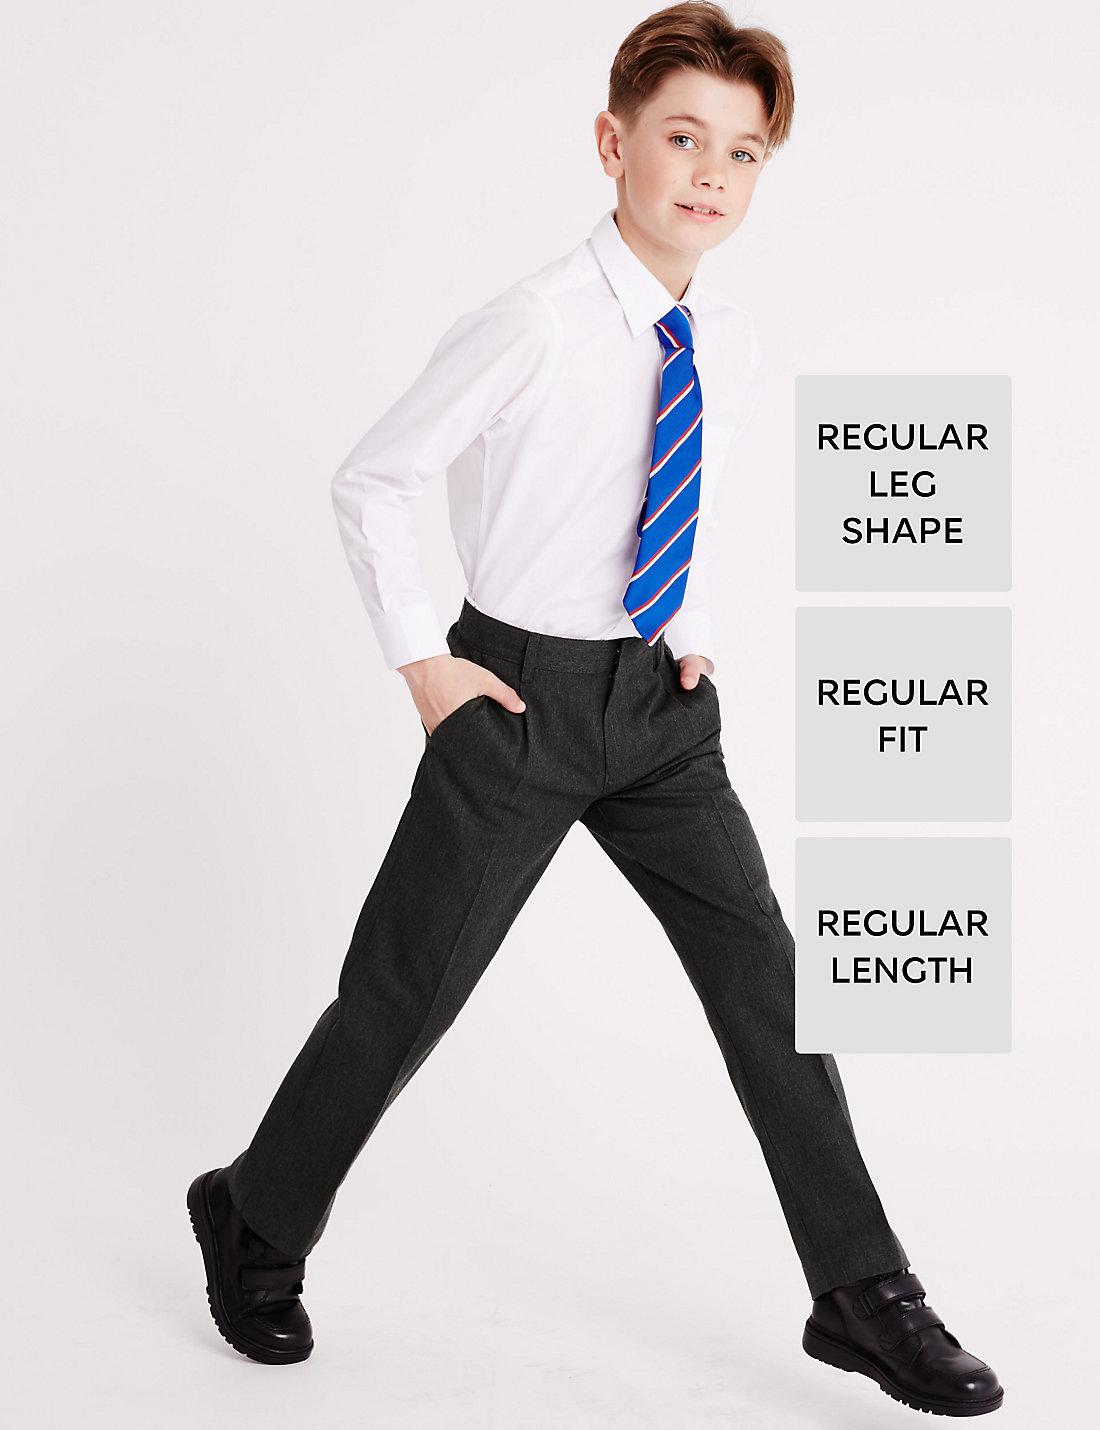 Regular Leg Pantolon